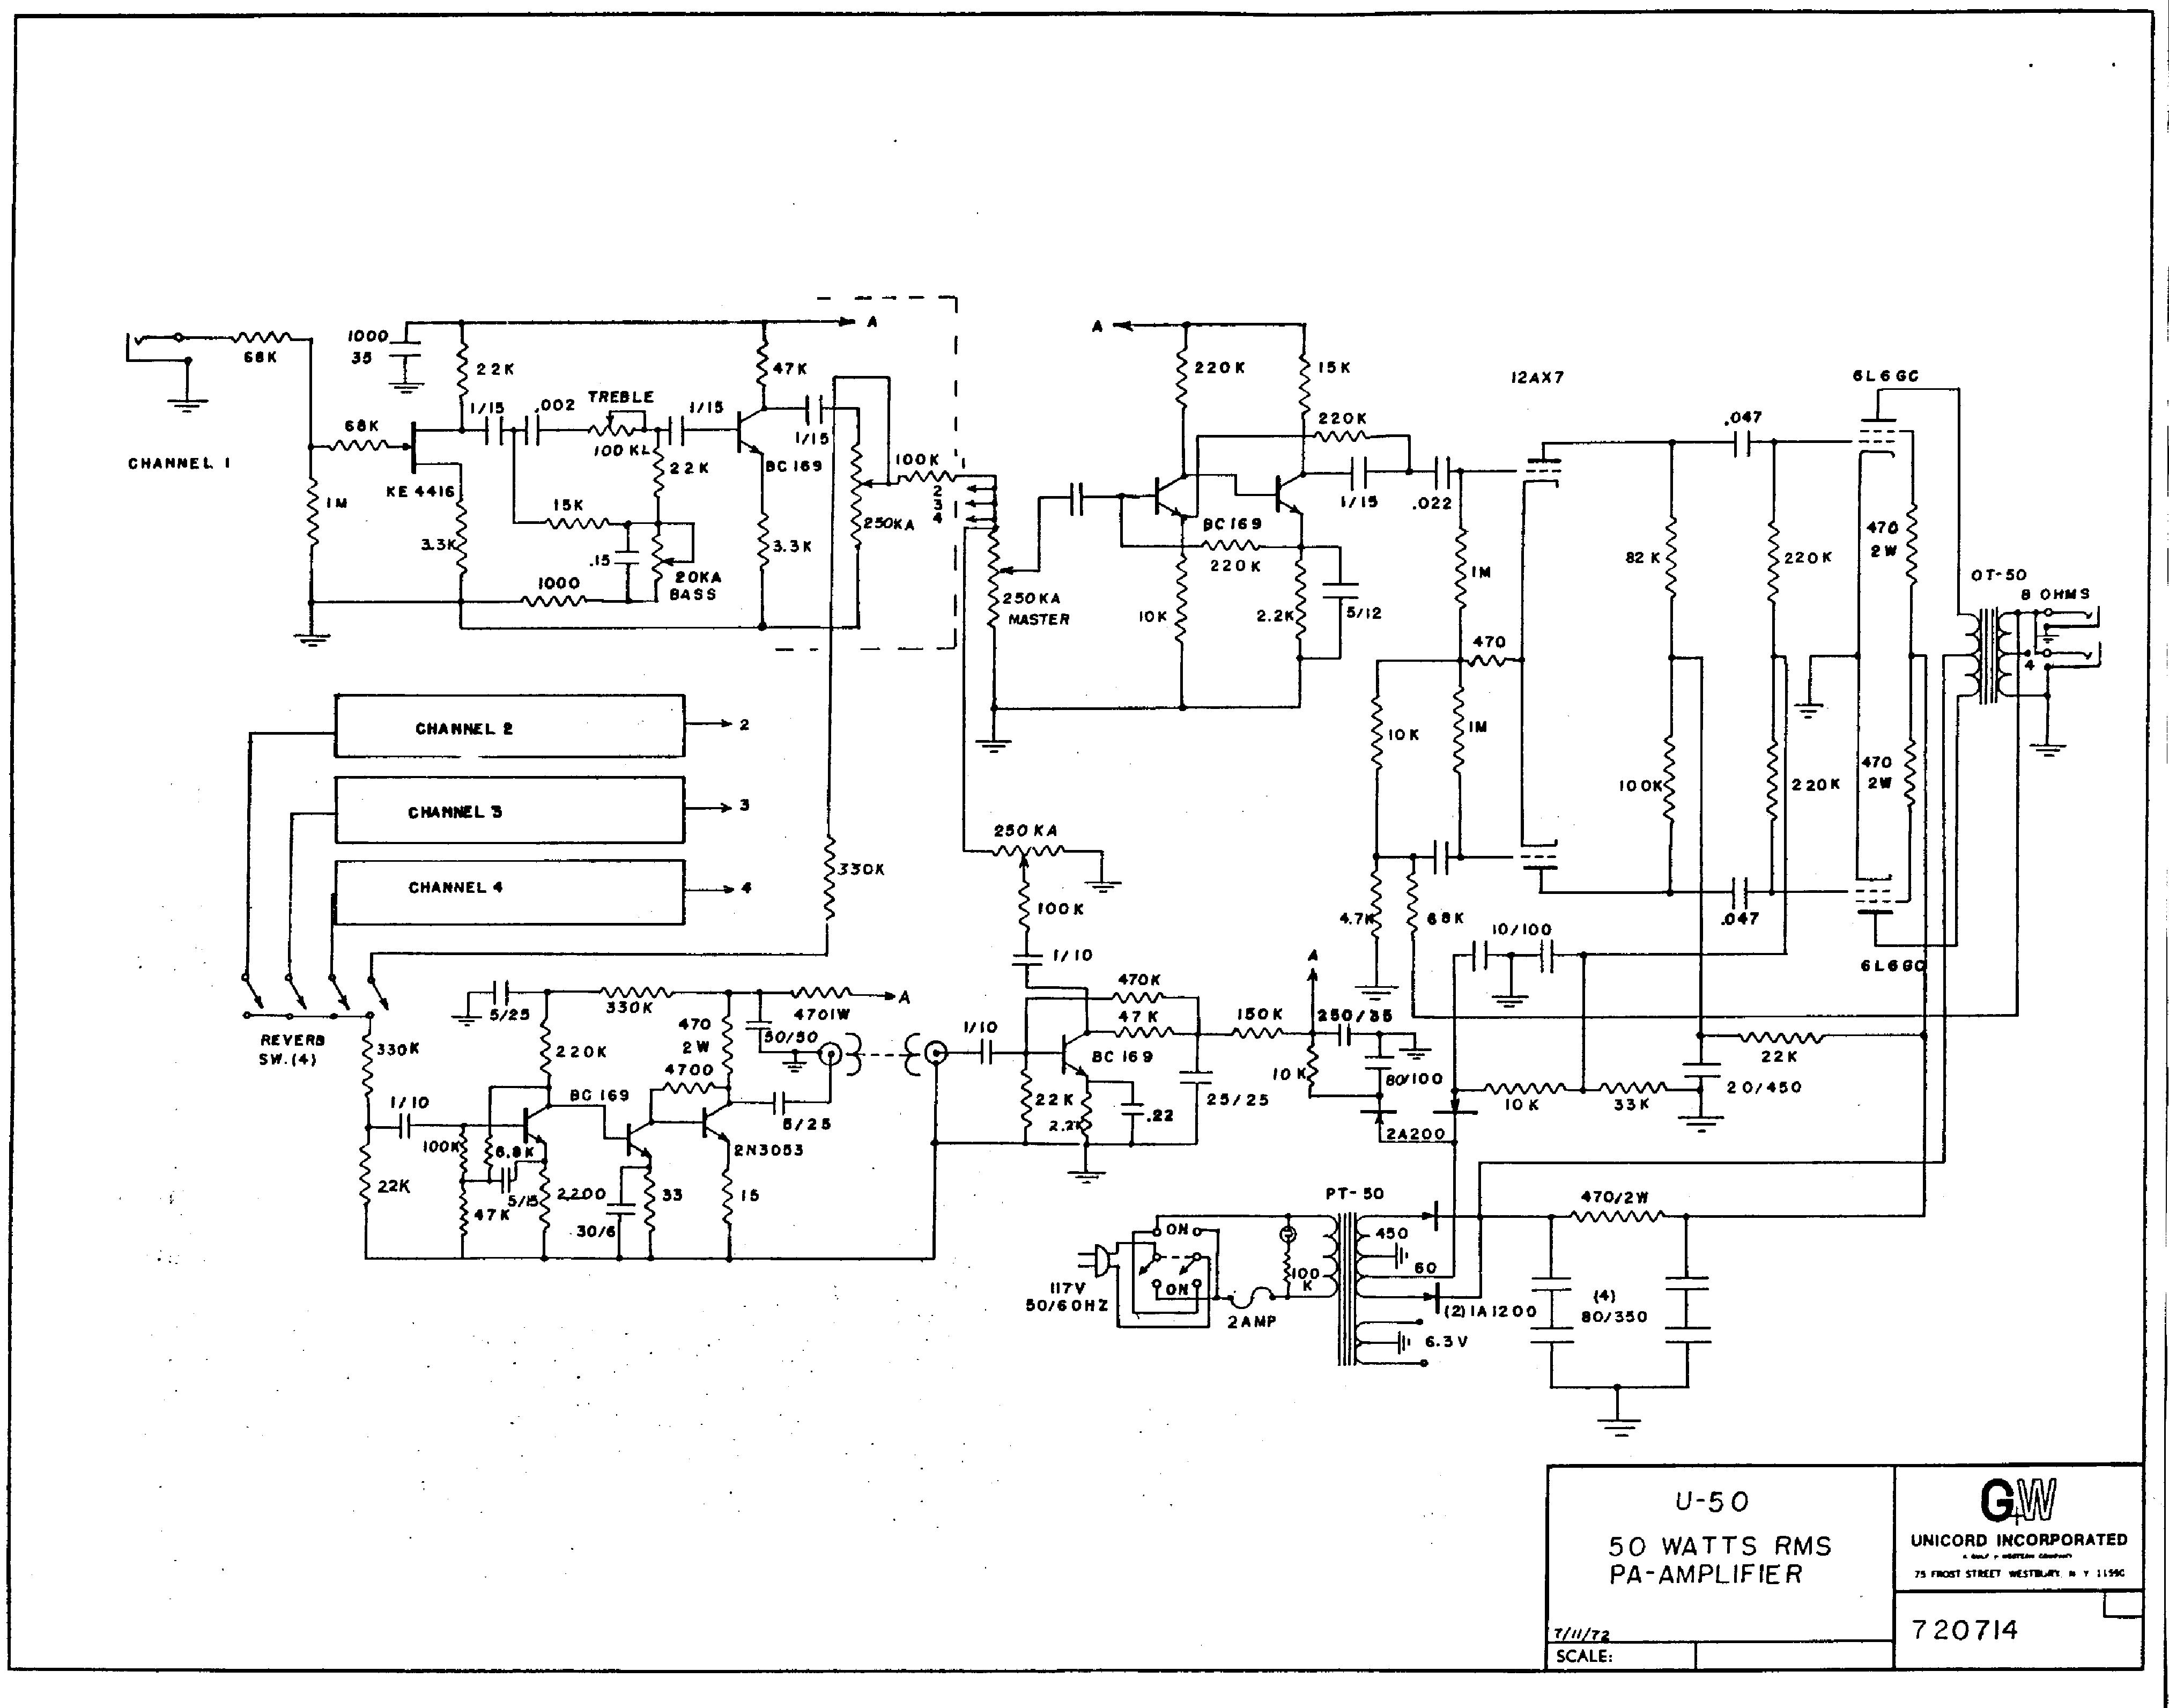 Univox Guitar Wiring Diagram : Univox u b schematic wiring diagram